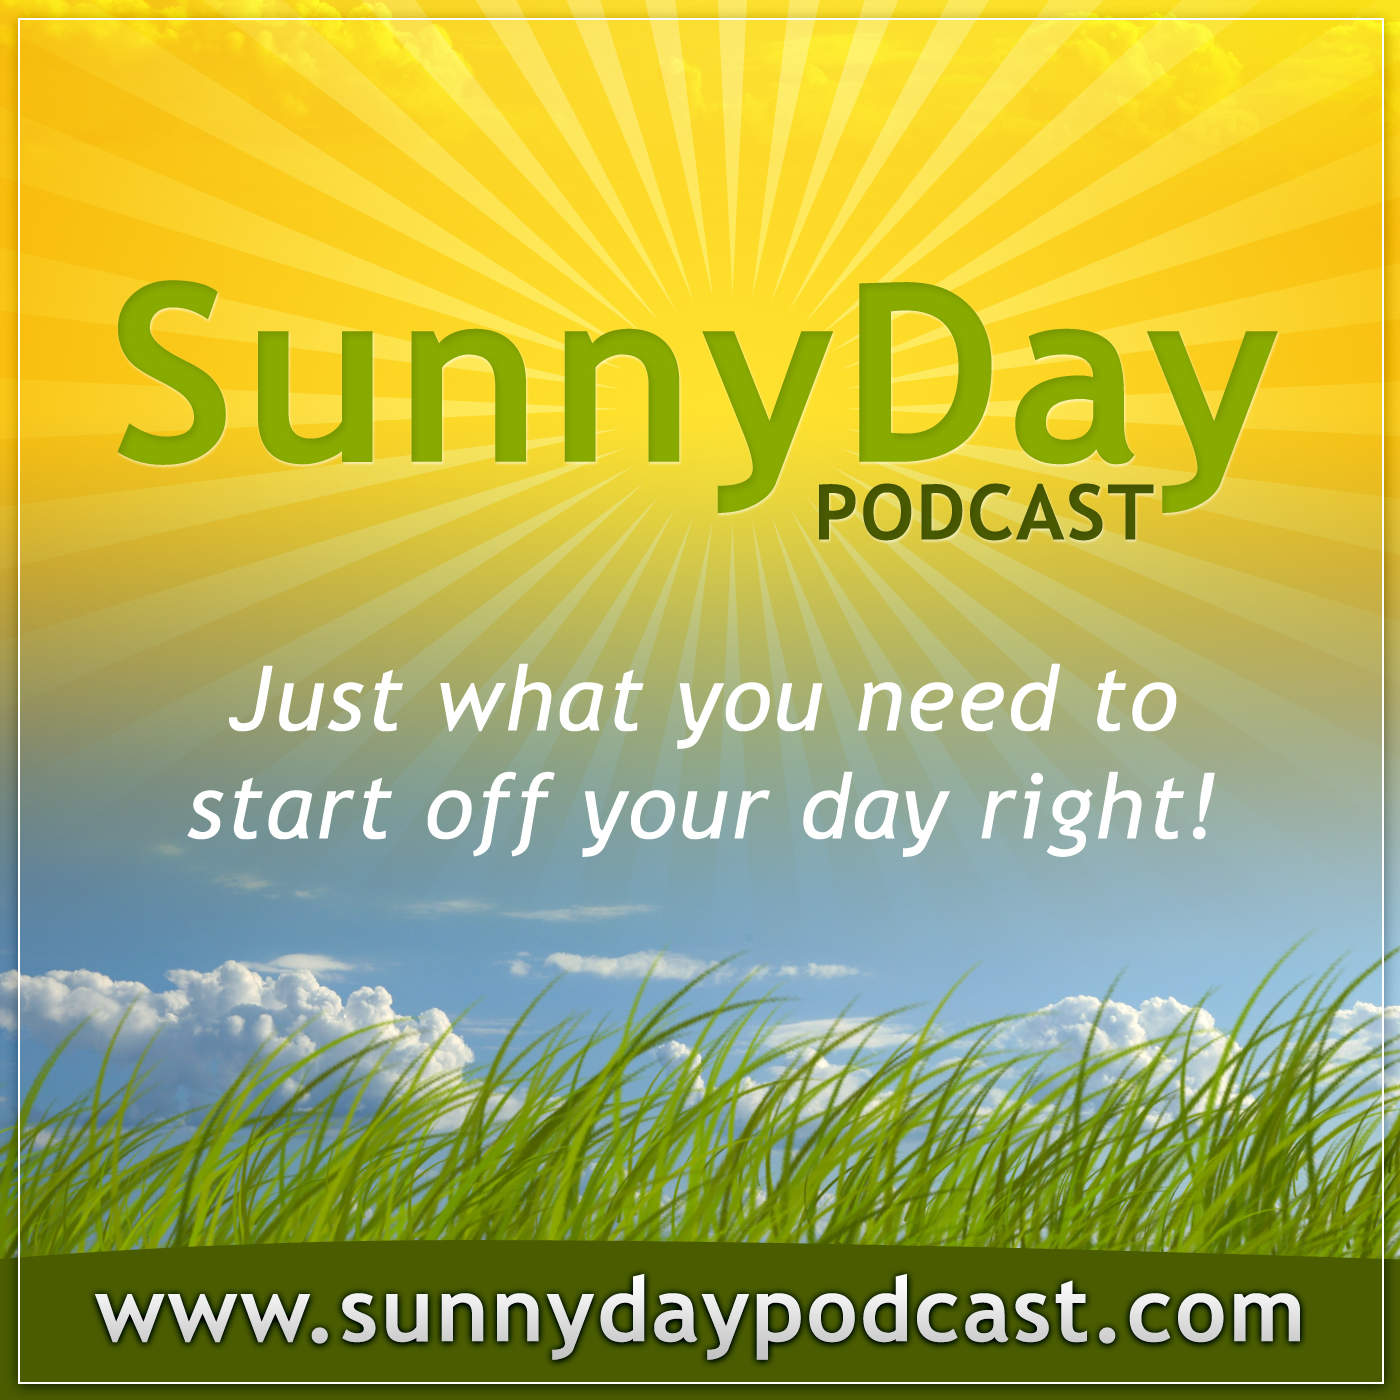 Sunny day Podcast